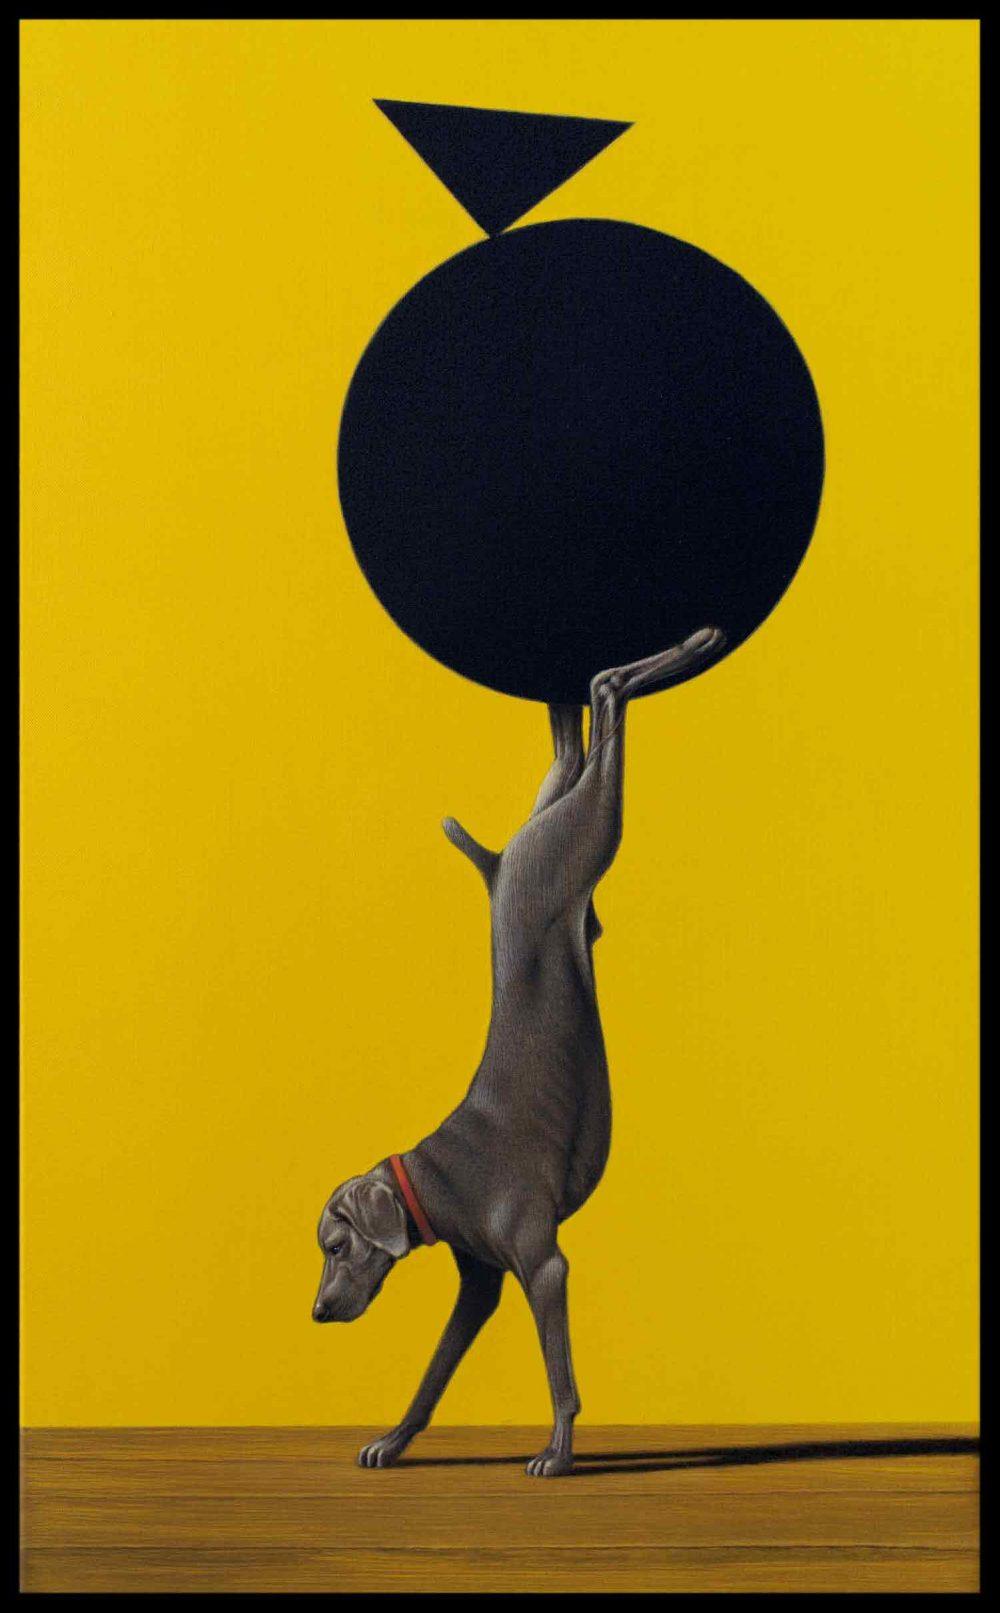 Disziplin 2 (2017), Acryl auf Leinwand, 50 x 30 cm